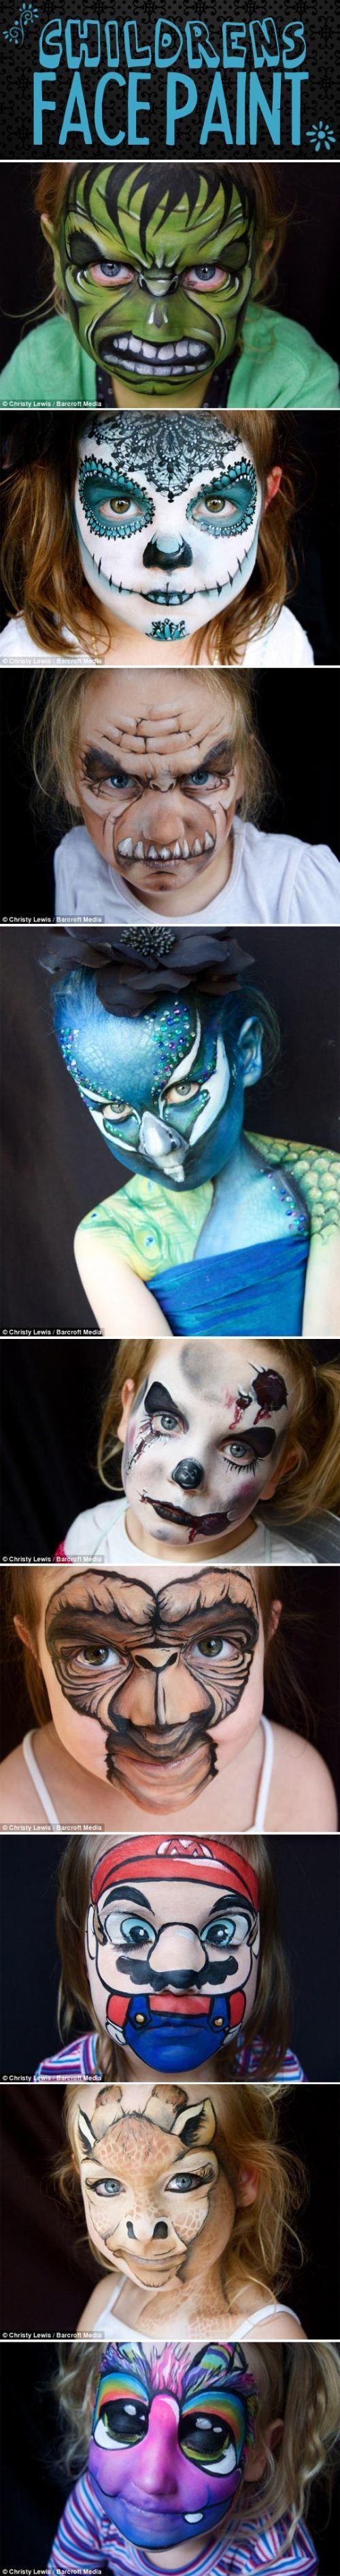 Children's Facepaint- the peacock is amazing!